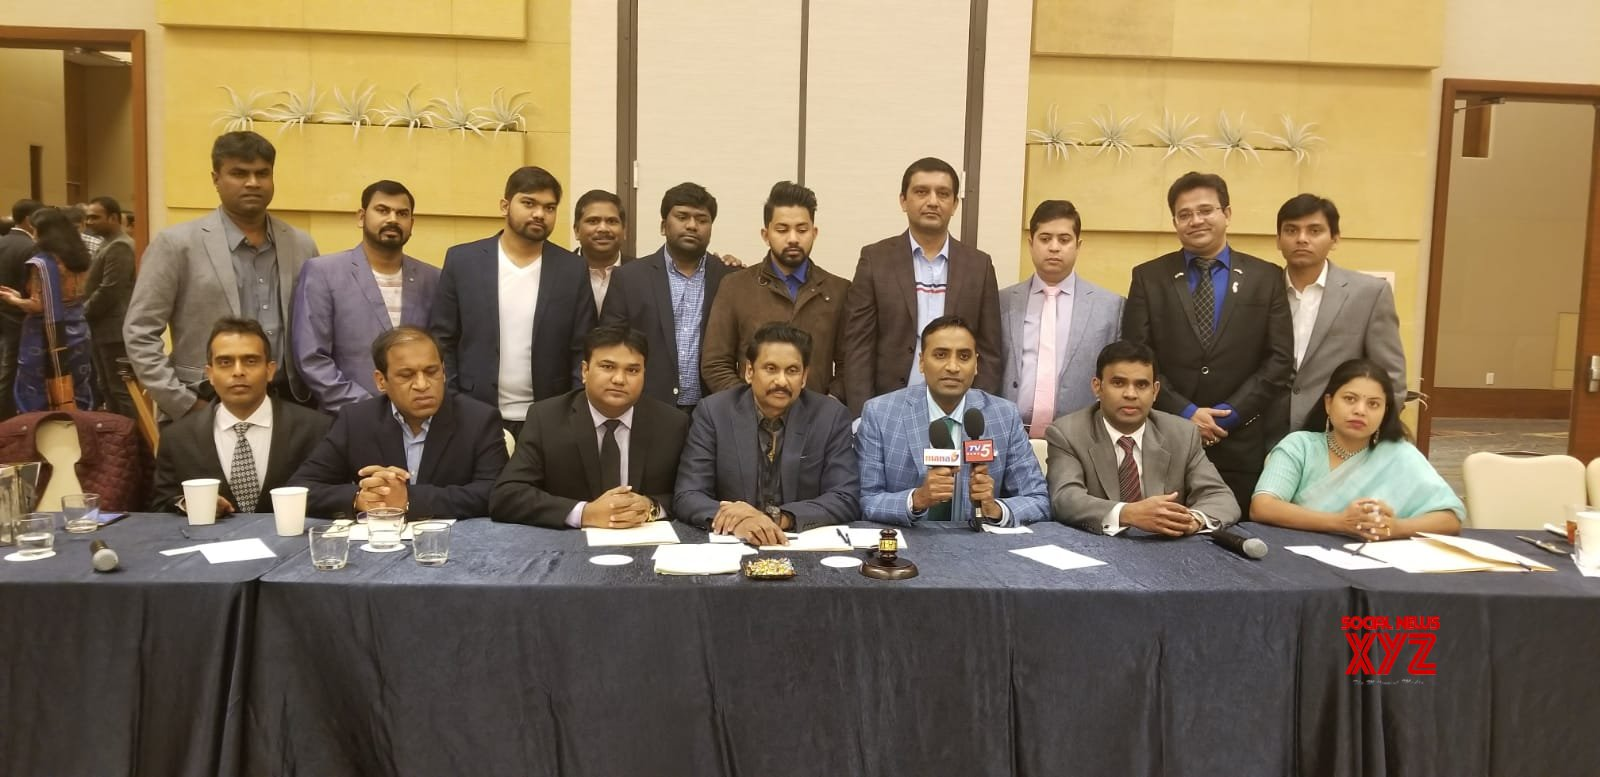 Telangana American Telugu Association (TATA) forms new board for 2019-2022